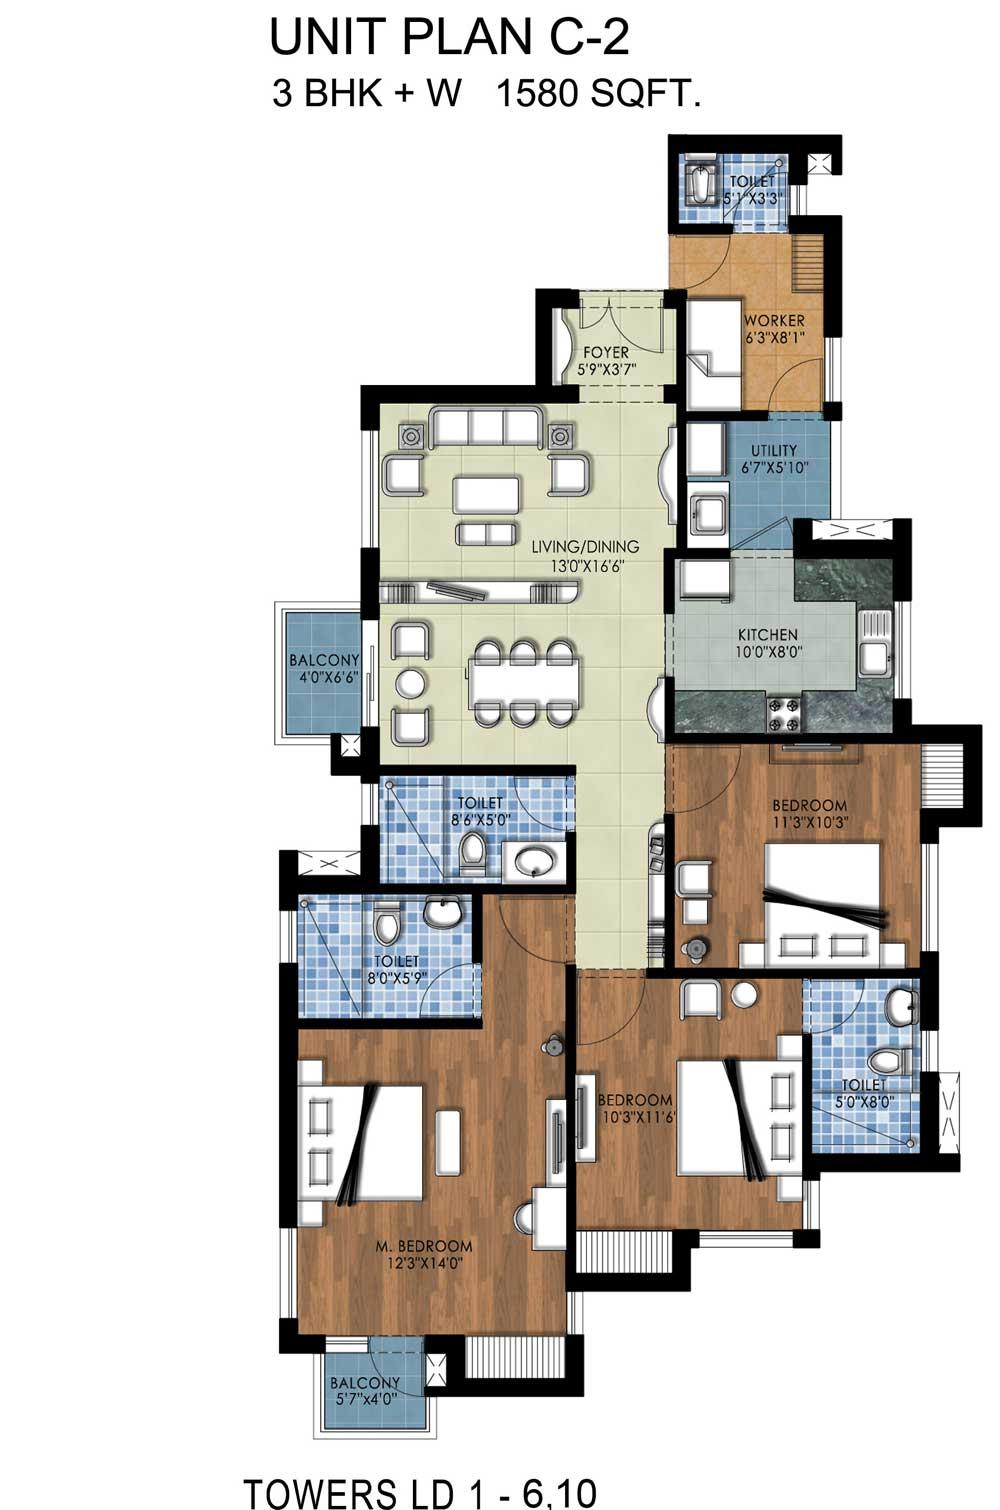 C:UsersVishal AmlerDesktopRSPTower-C Tower C Typical Floor